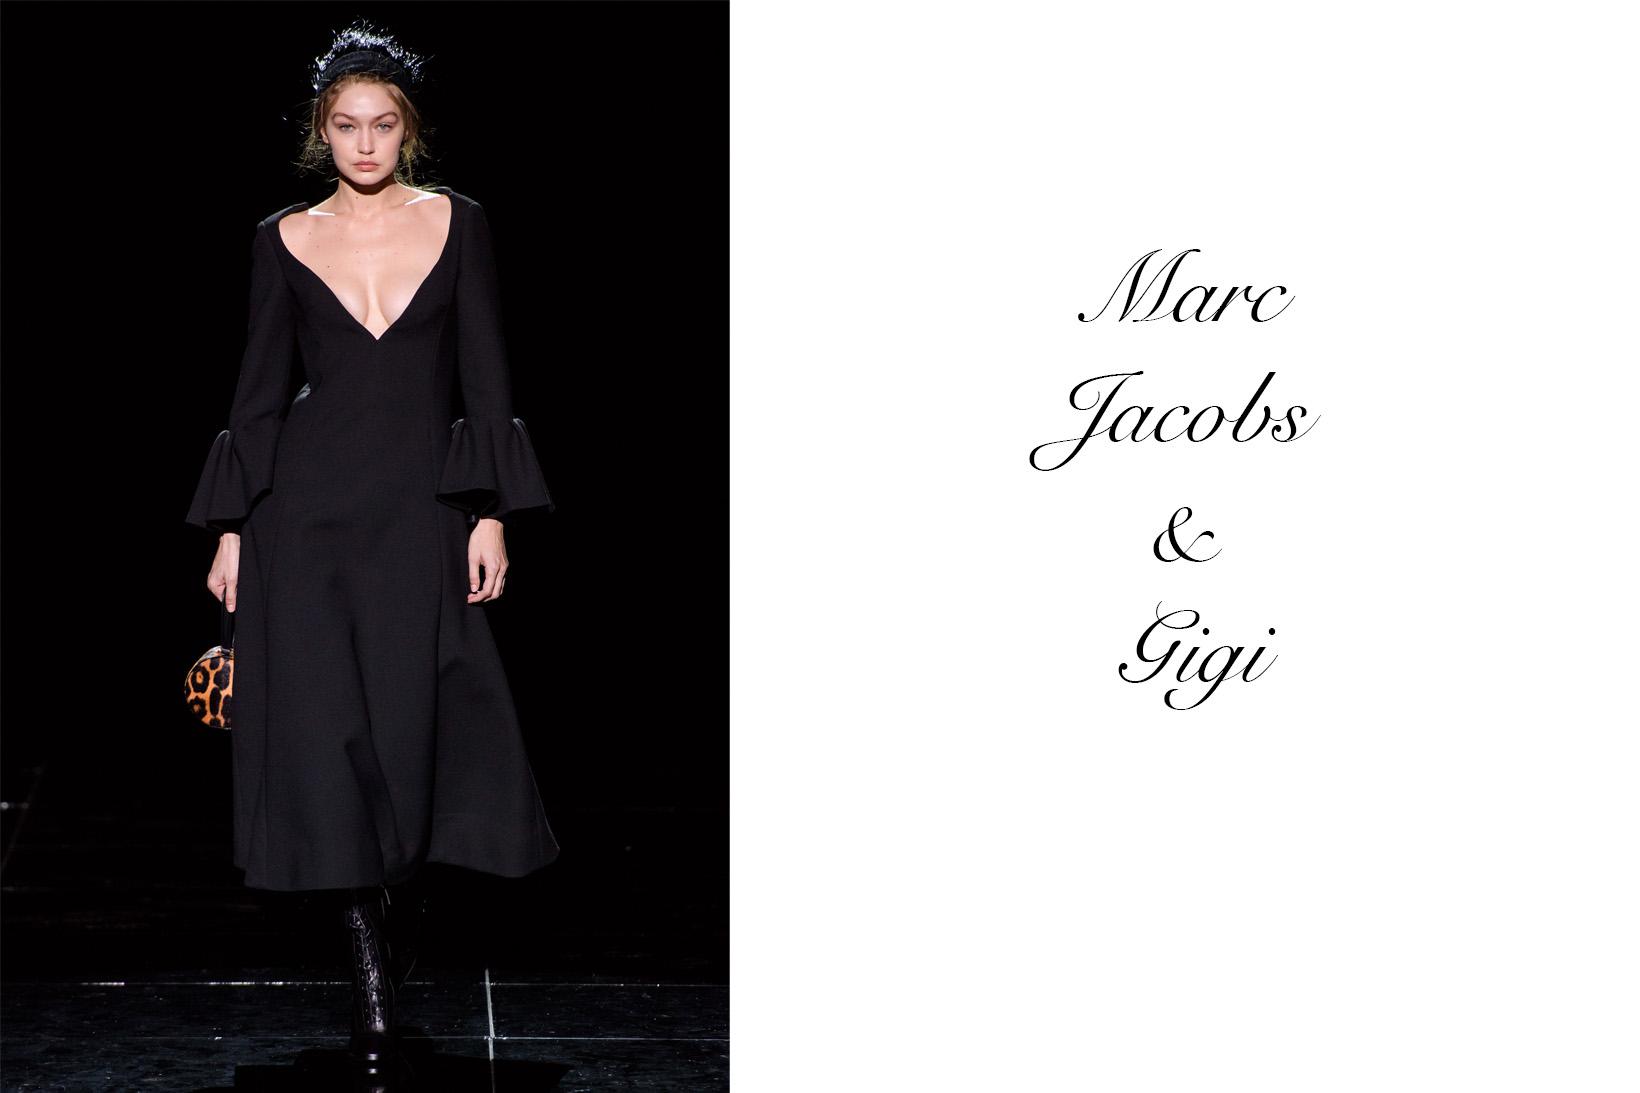 Gigi and Marc Jacobs